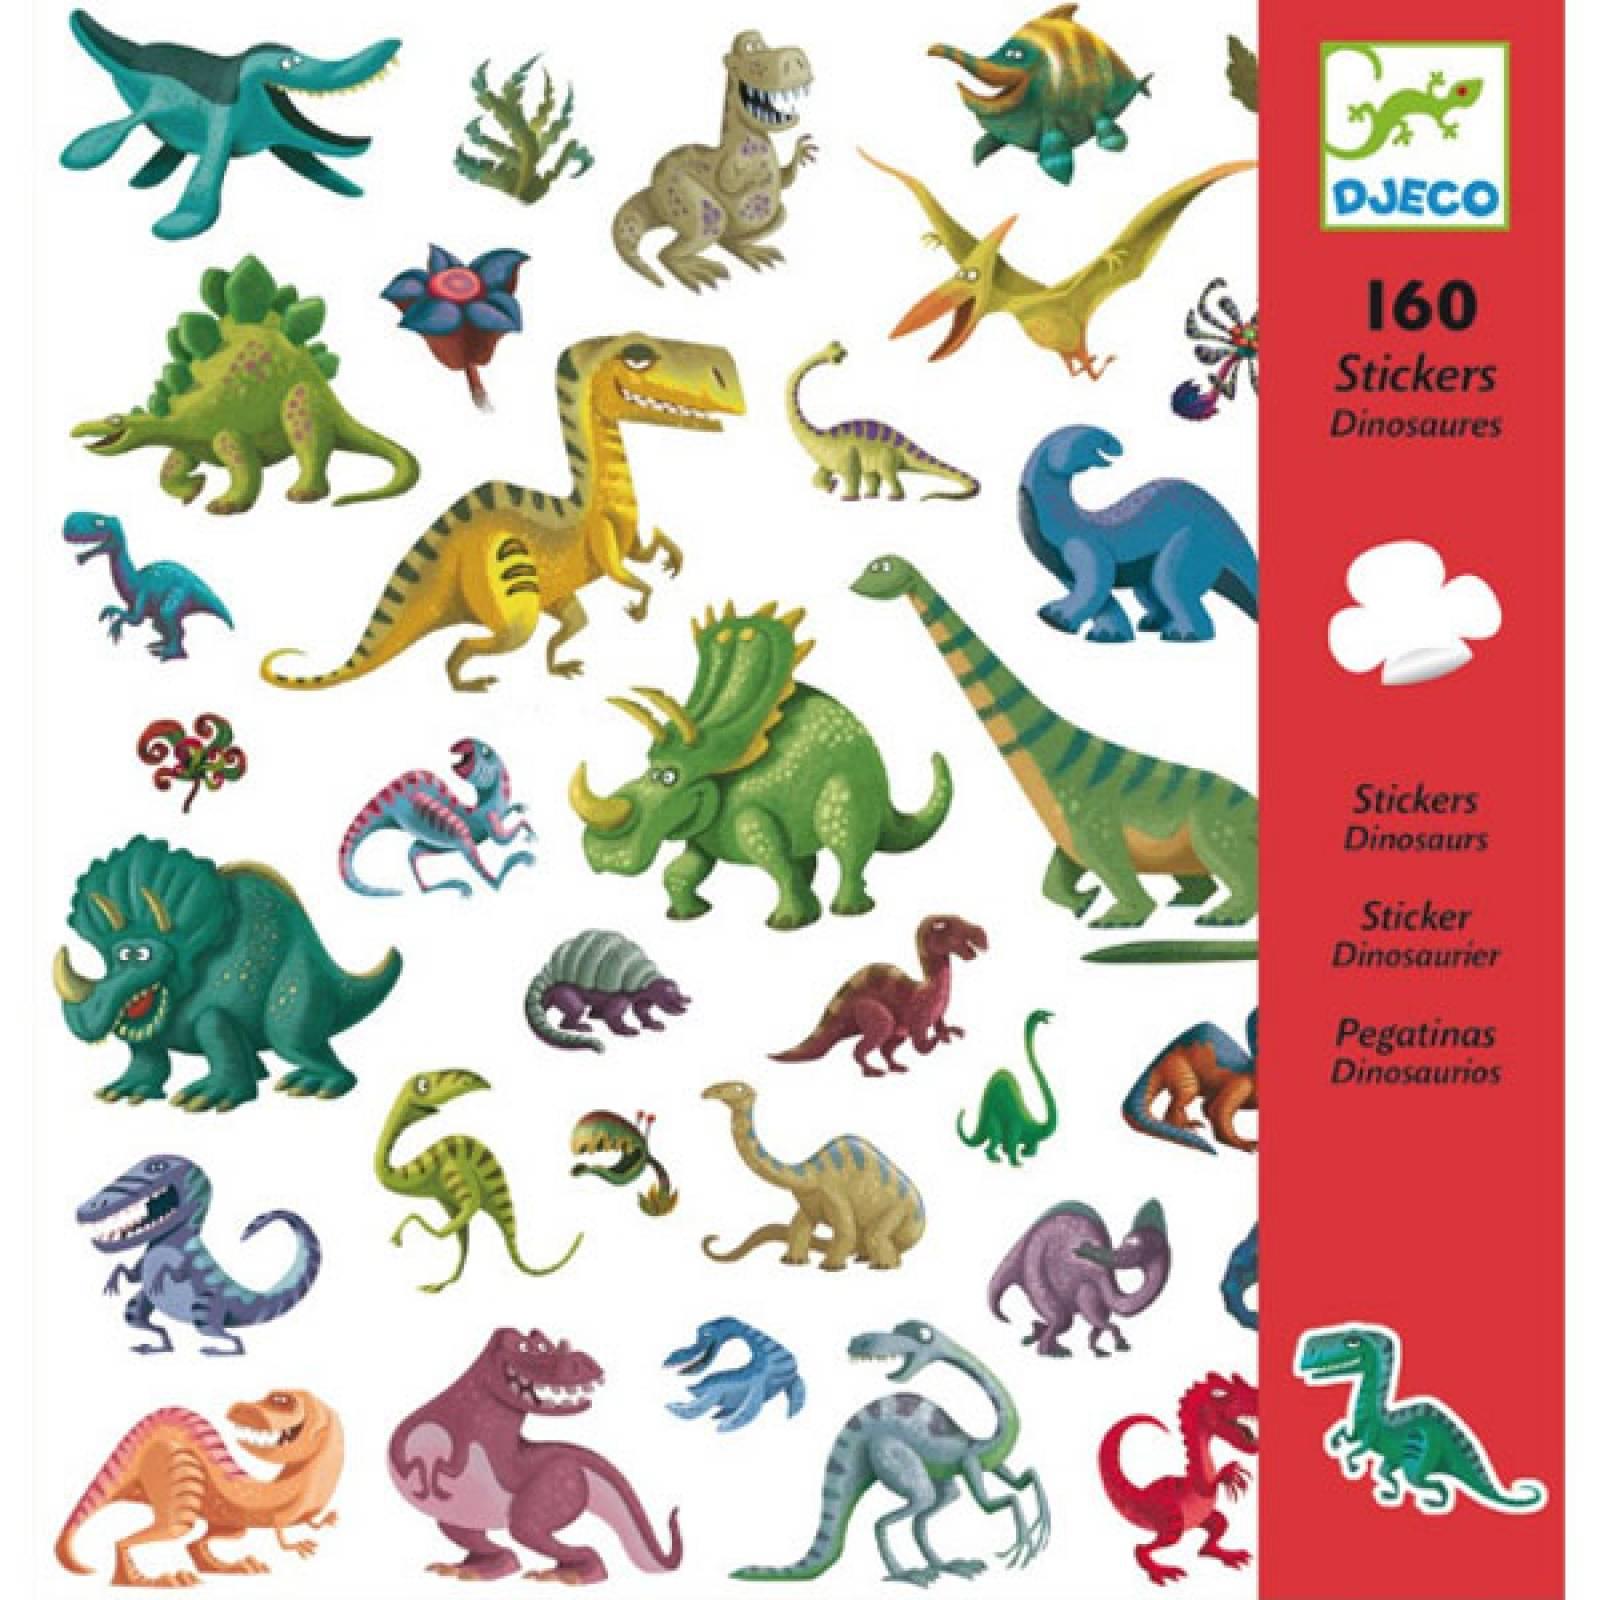 Dinosaur Stickers - Stylish 160 Sticker Pack By Djeco